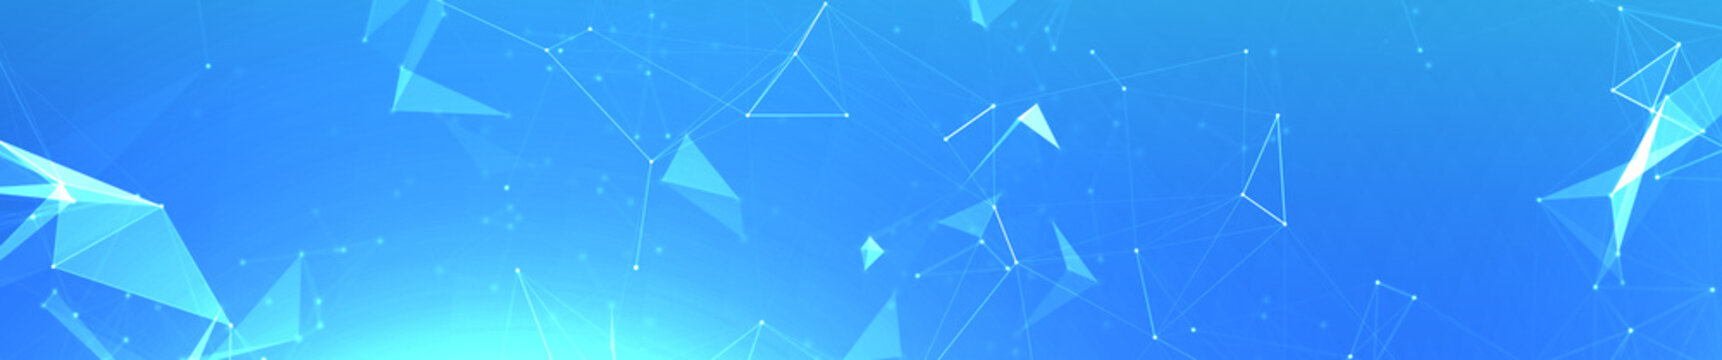 Light blue plexus panoramic hero background